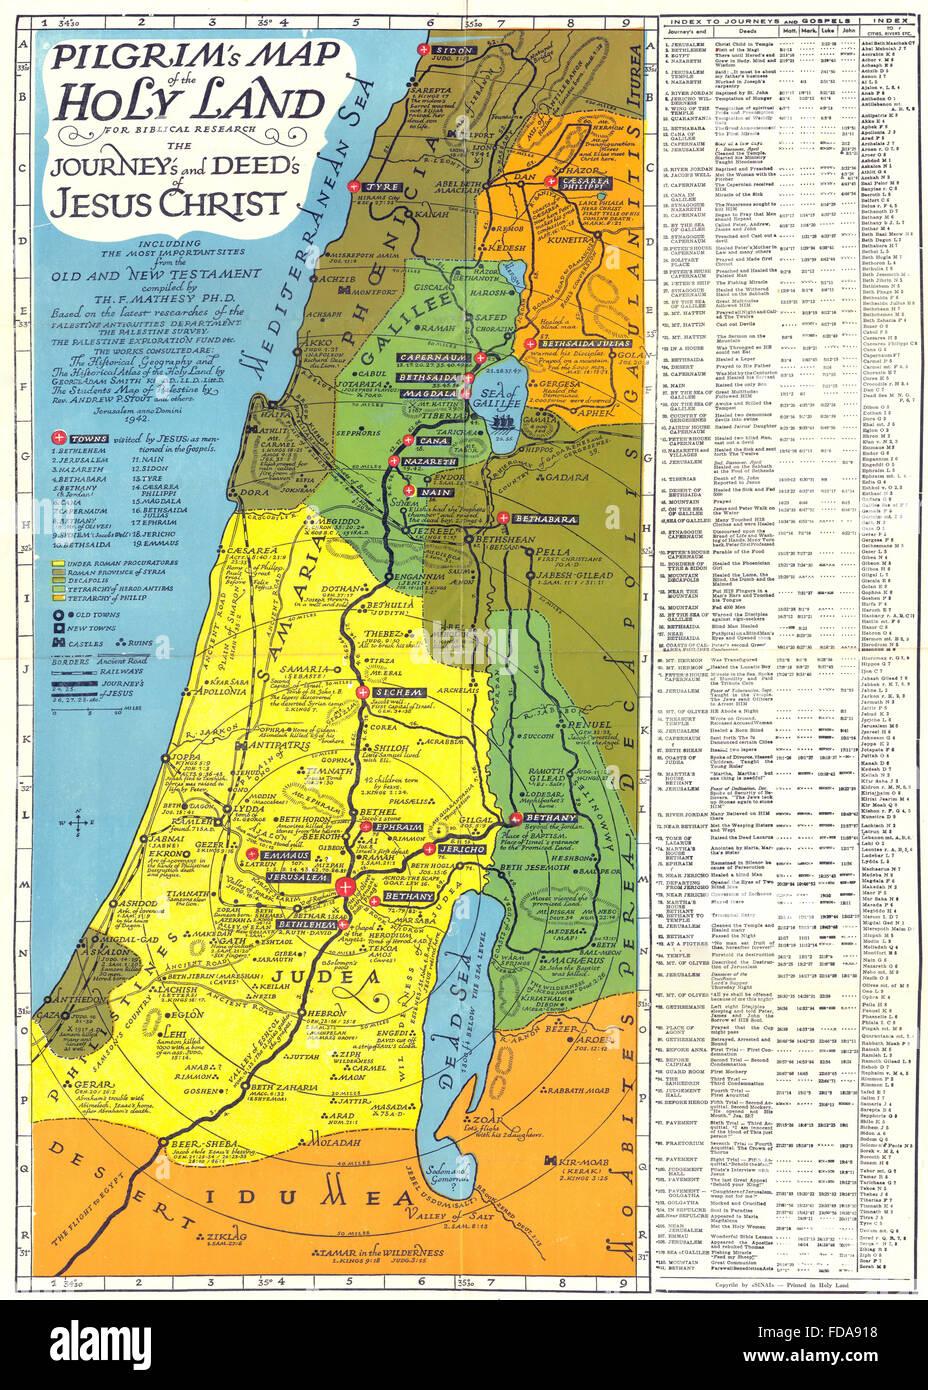 israel pilgrim map holy land biblical research journey deed jesus christ. israel pilgrim map holy land biblical research journey deed jesus